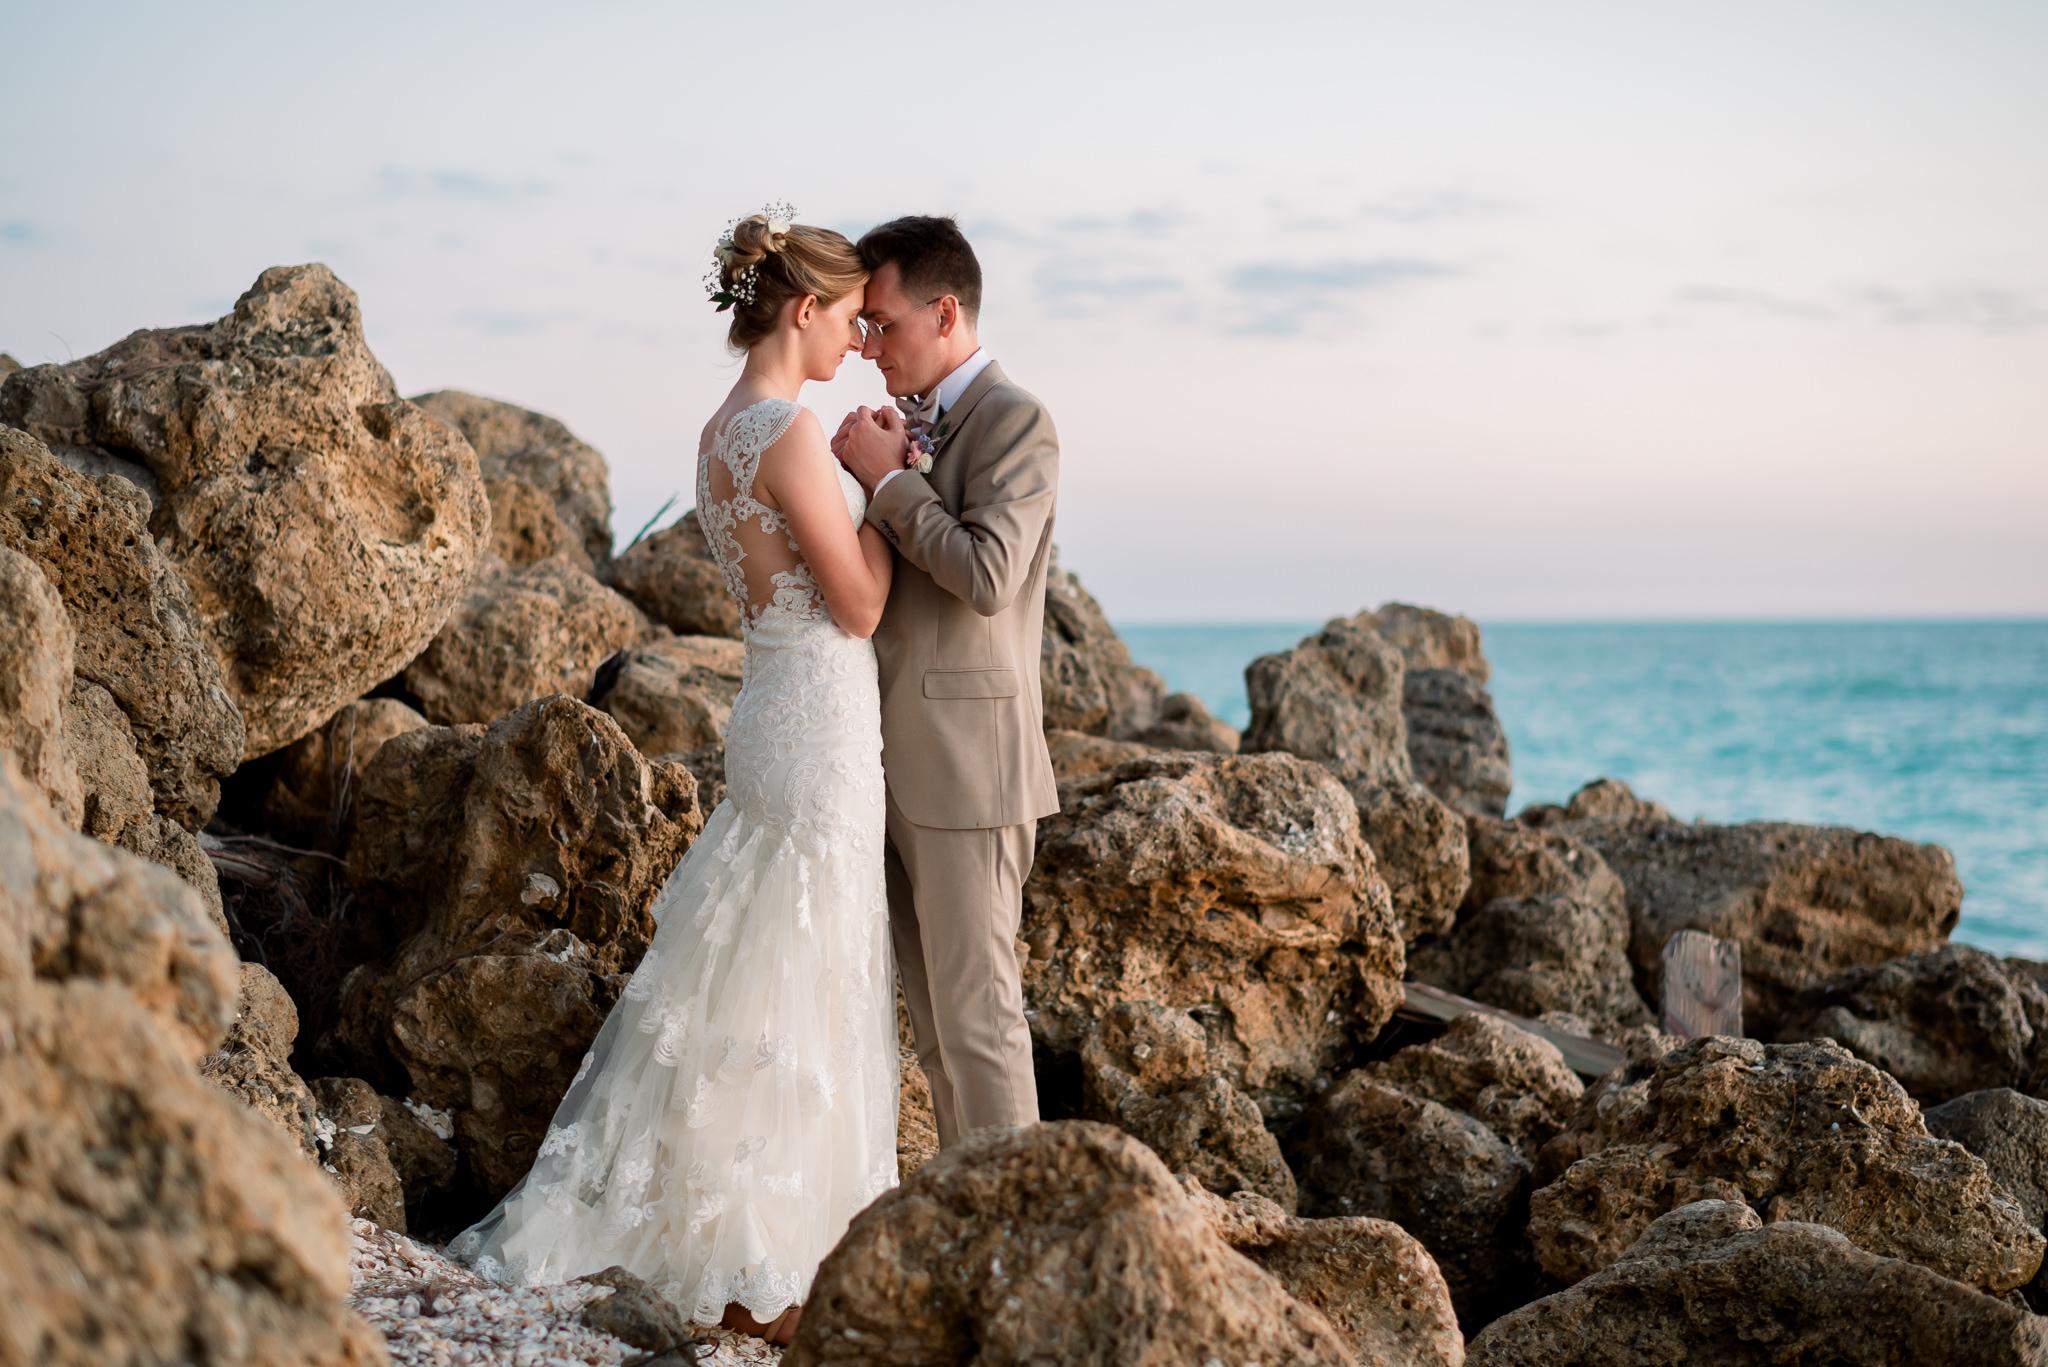 SARASOTA_WEDDING_PHOTOGRAPHY_SMMZ_6185.jpg